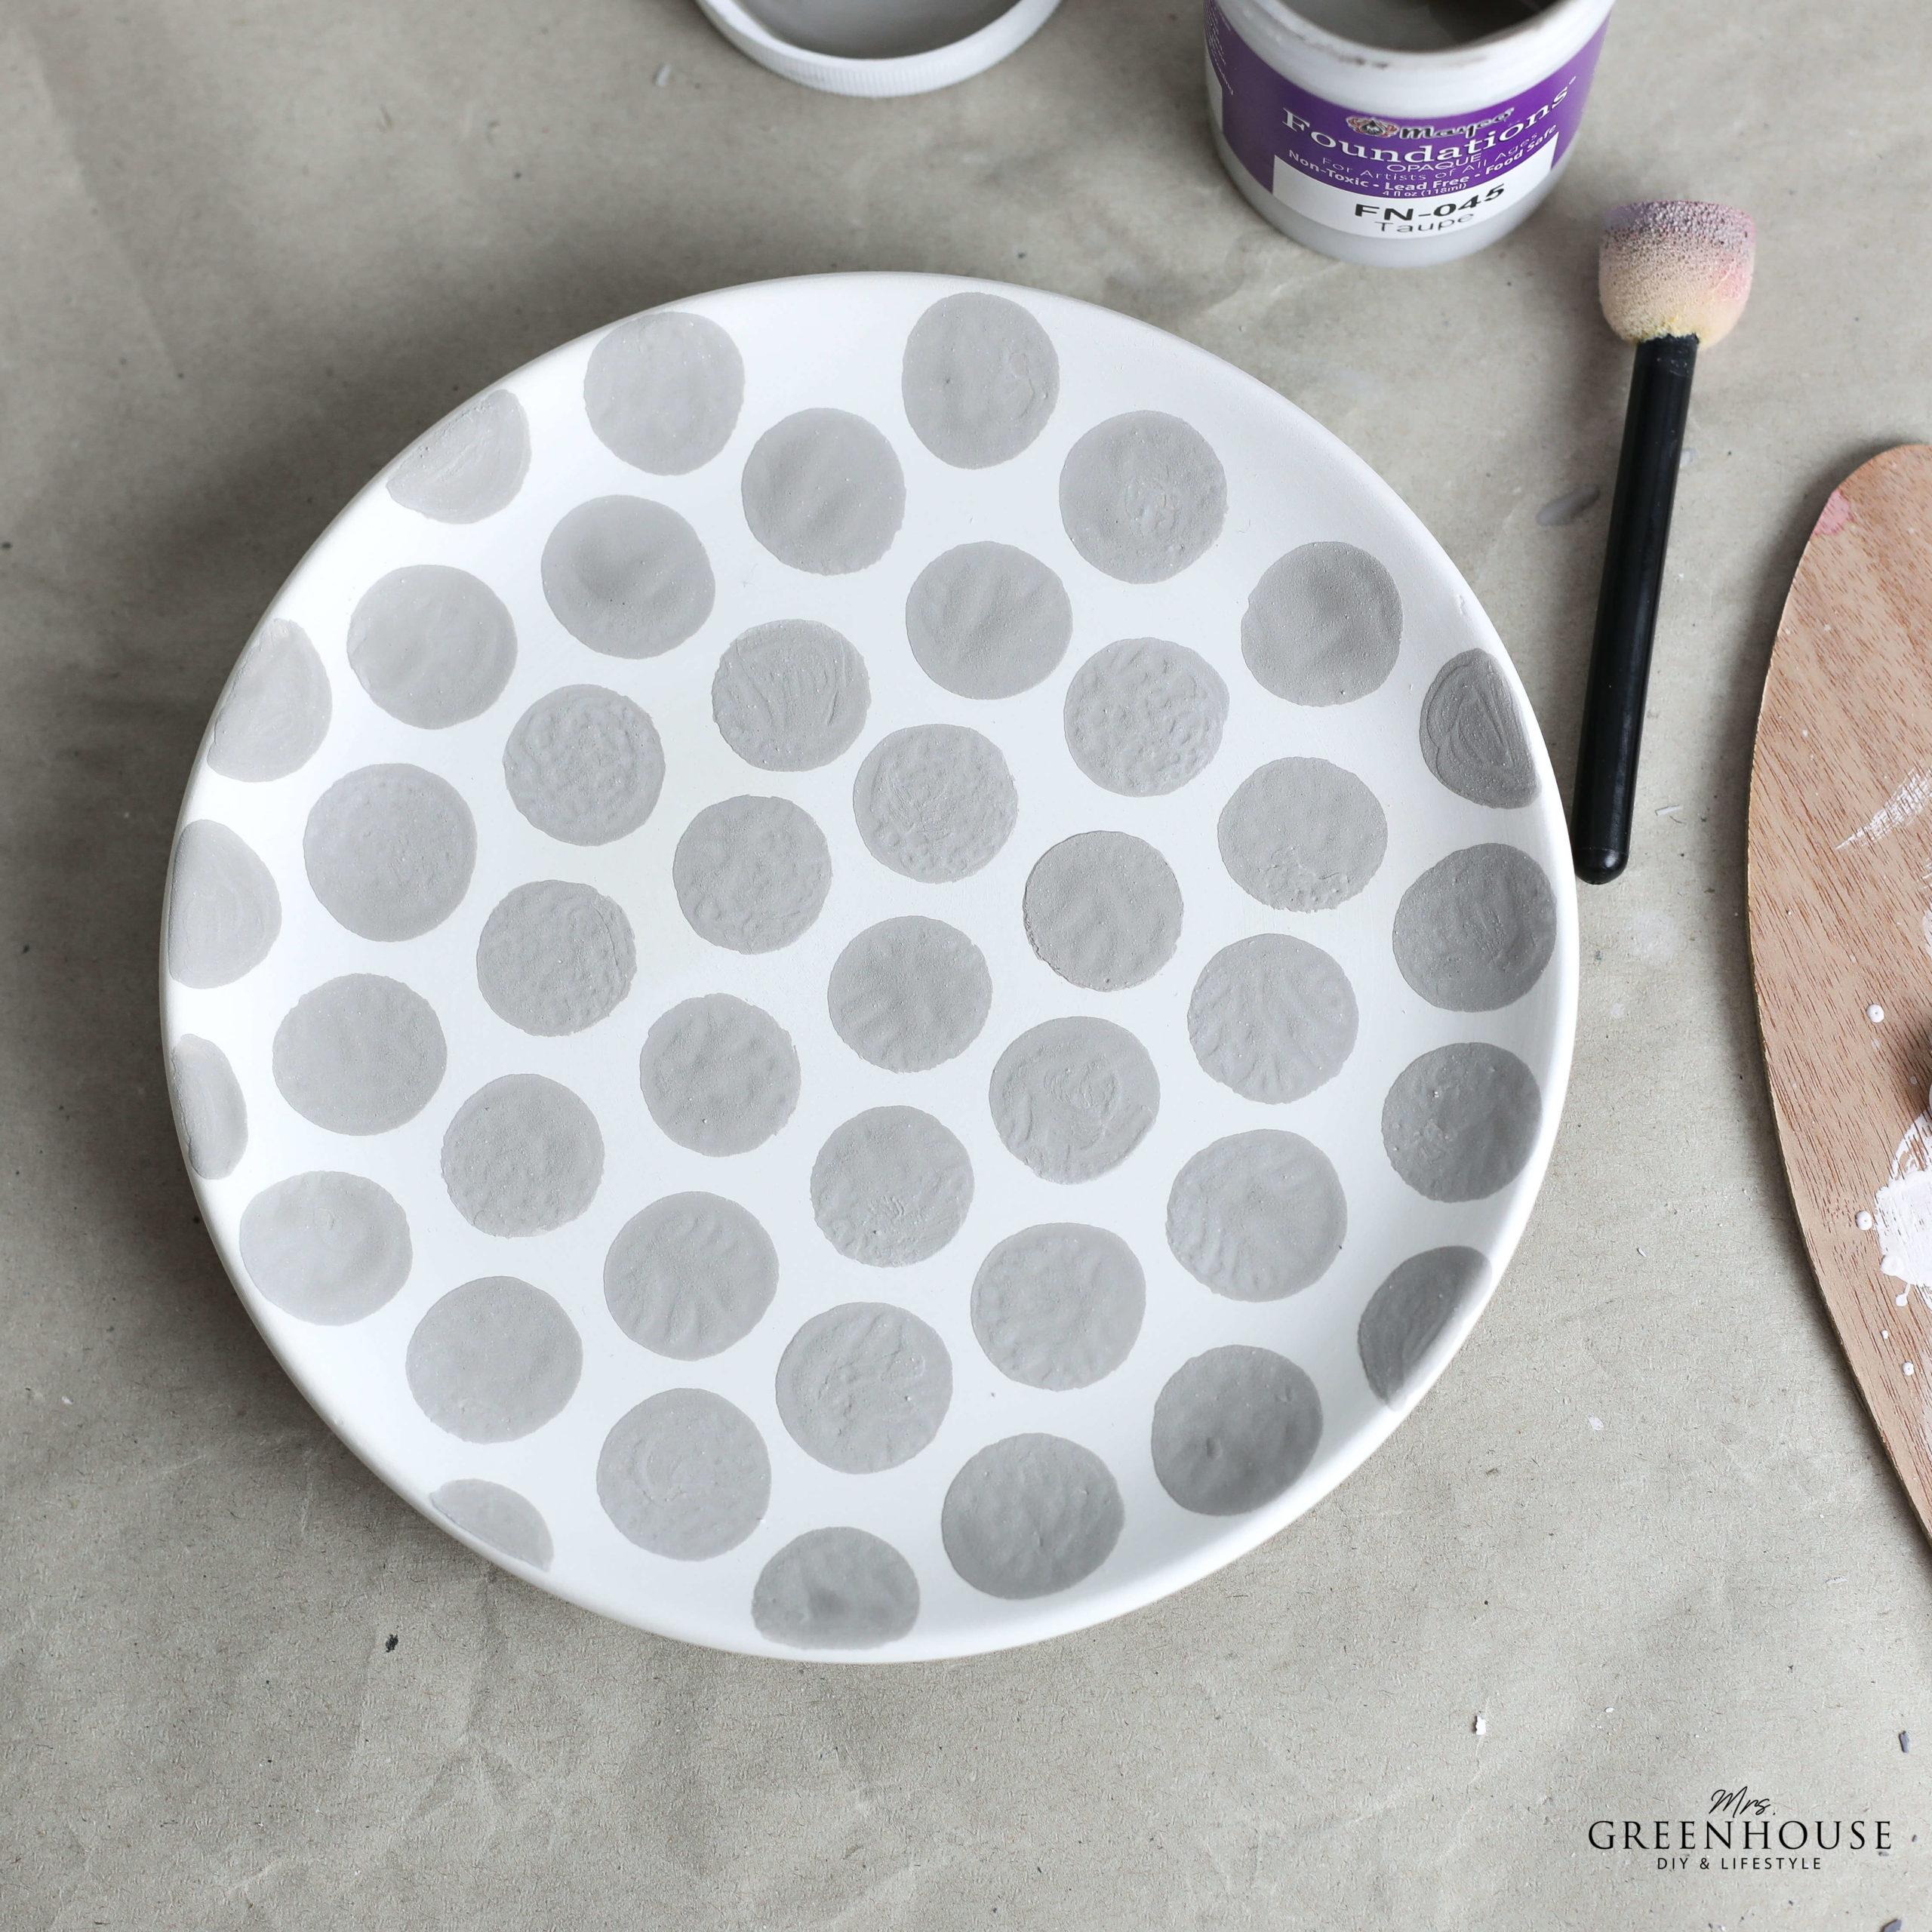 Keramik Teller mit Punkten bemalen